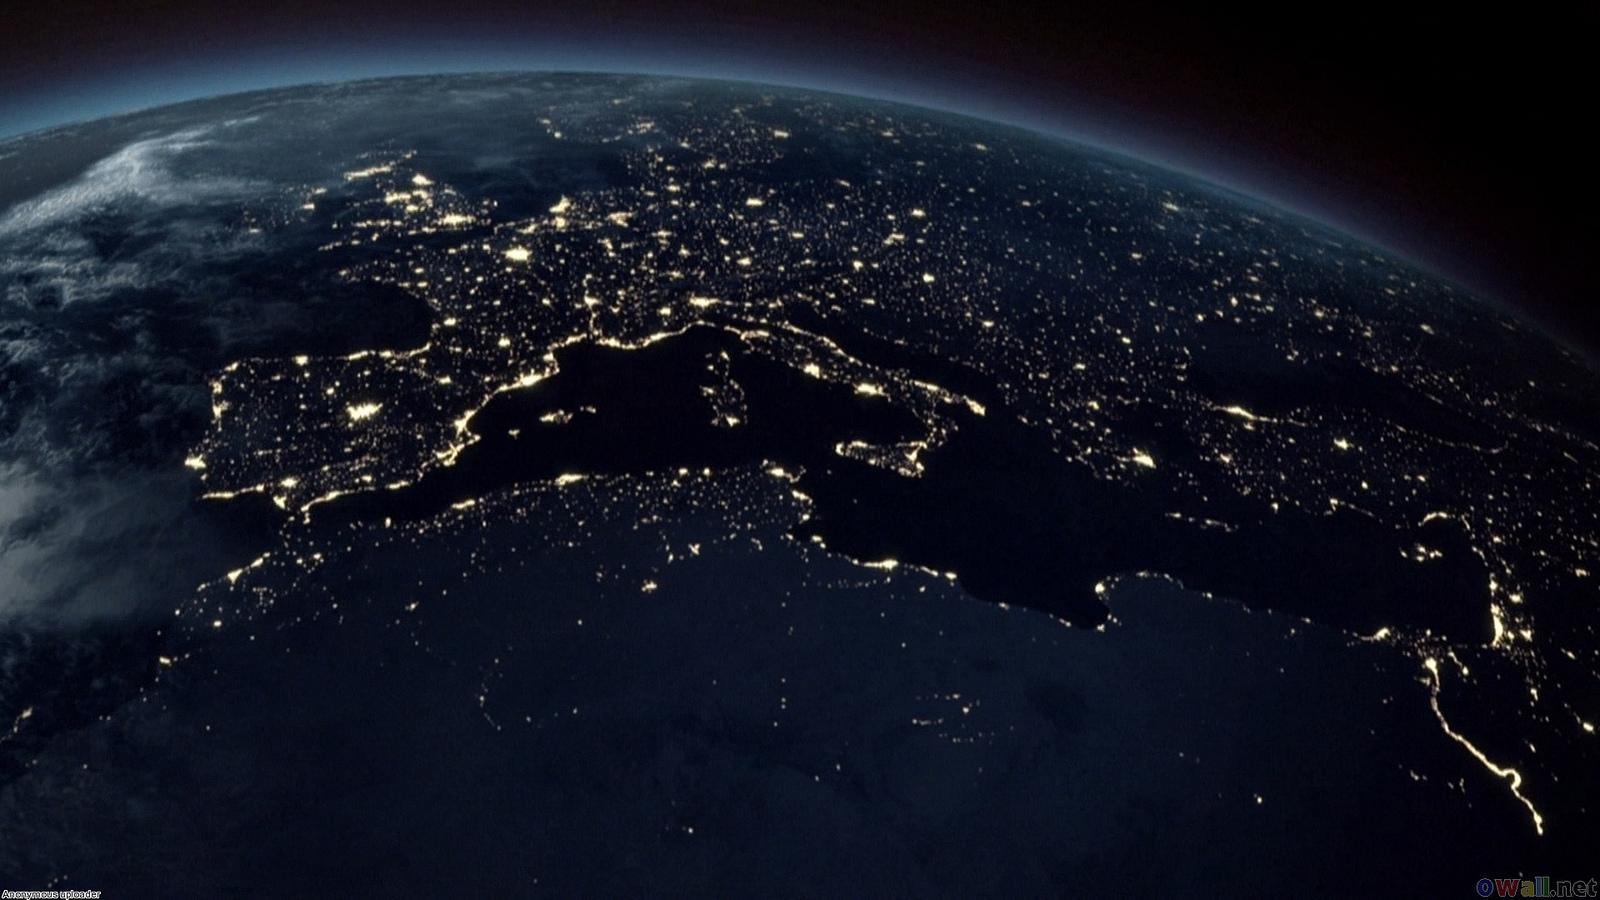 Satellite view of the world at night